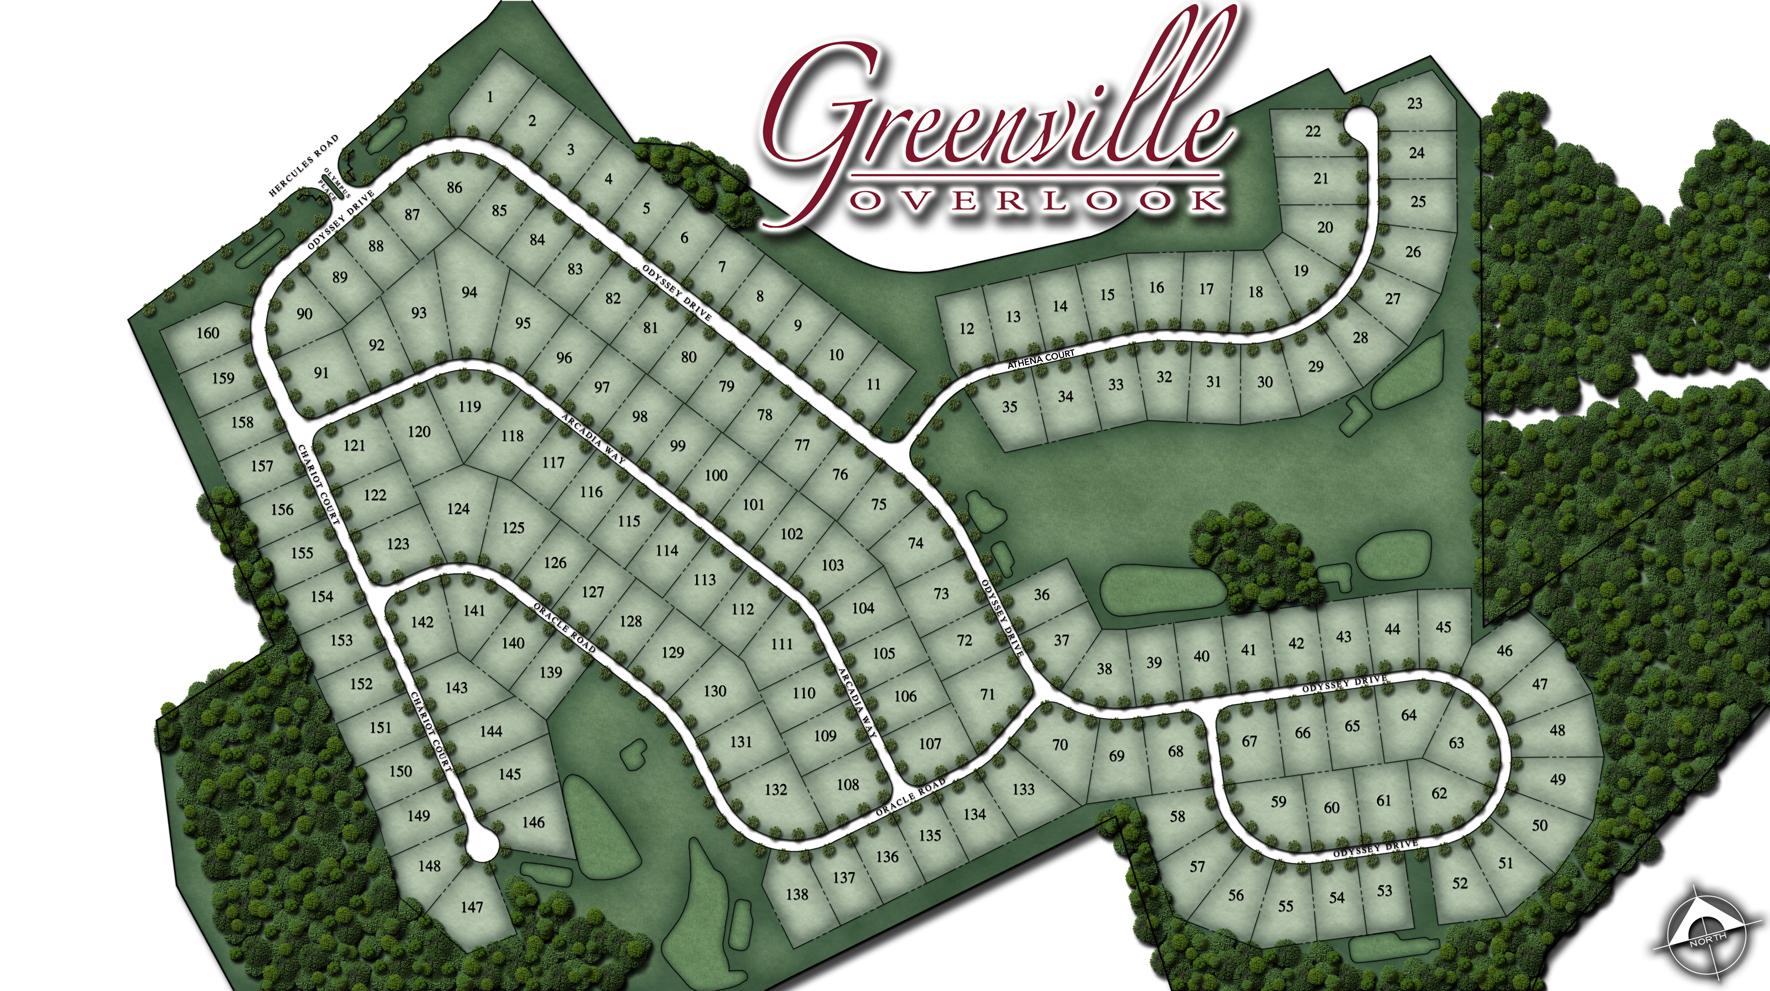 Greenville Overlook Site Plan